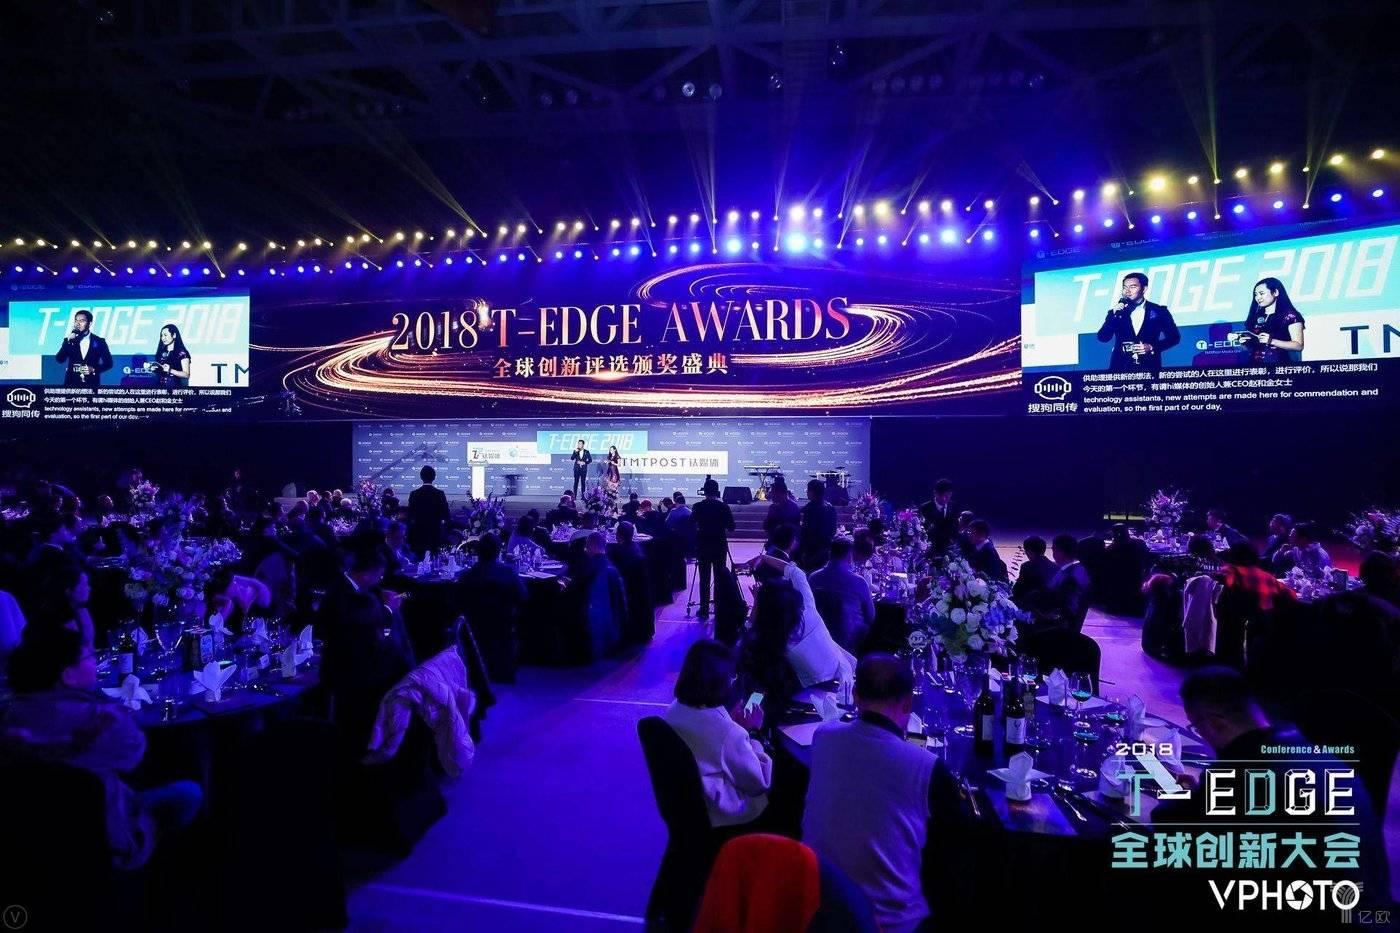 2018T-EDGE AWARDS.jpeg